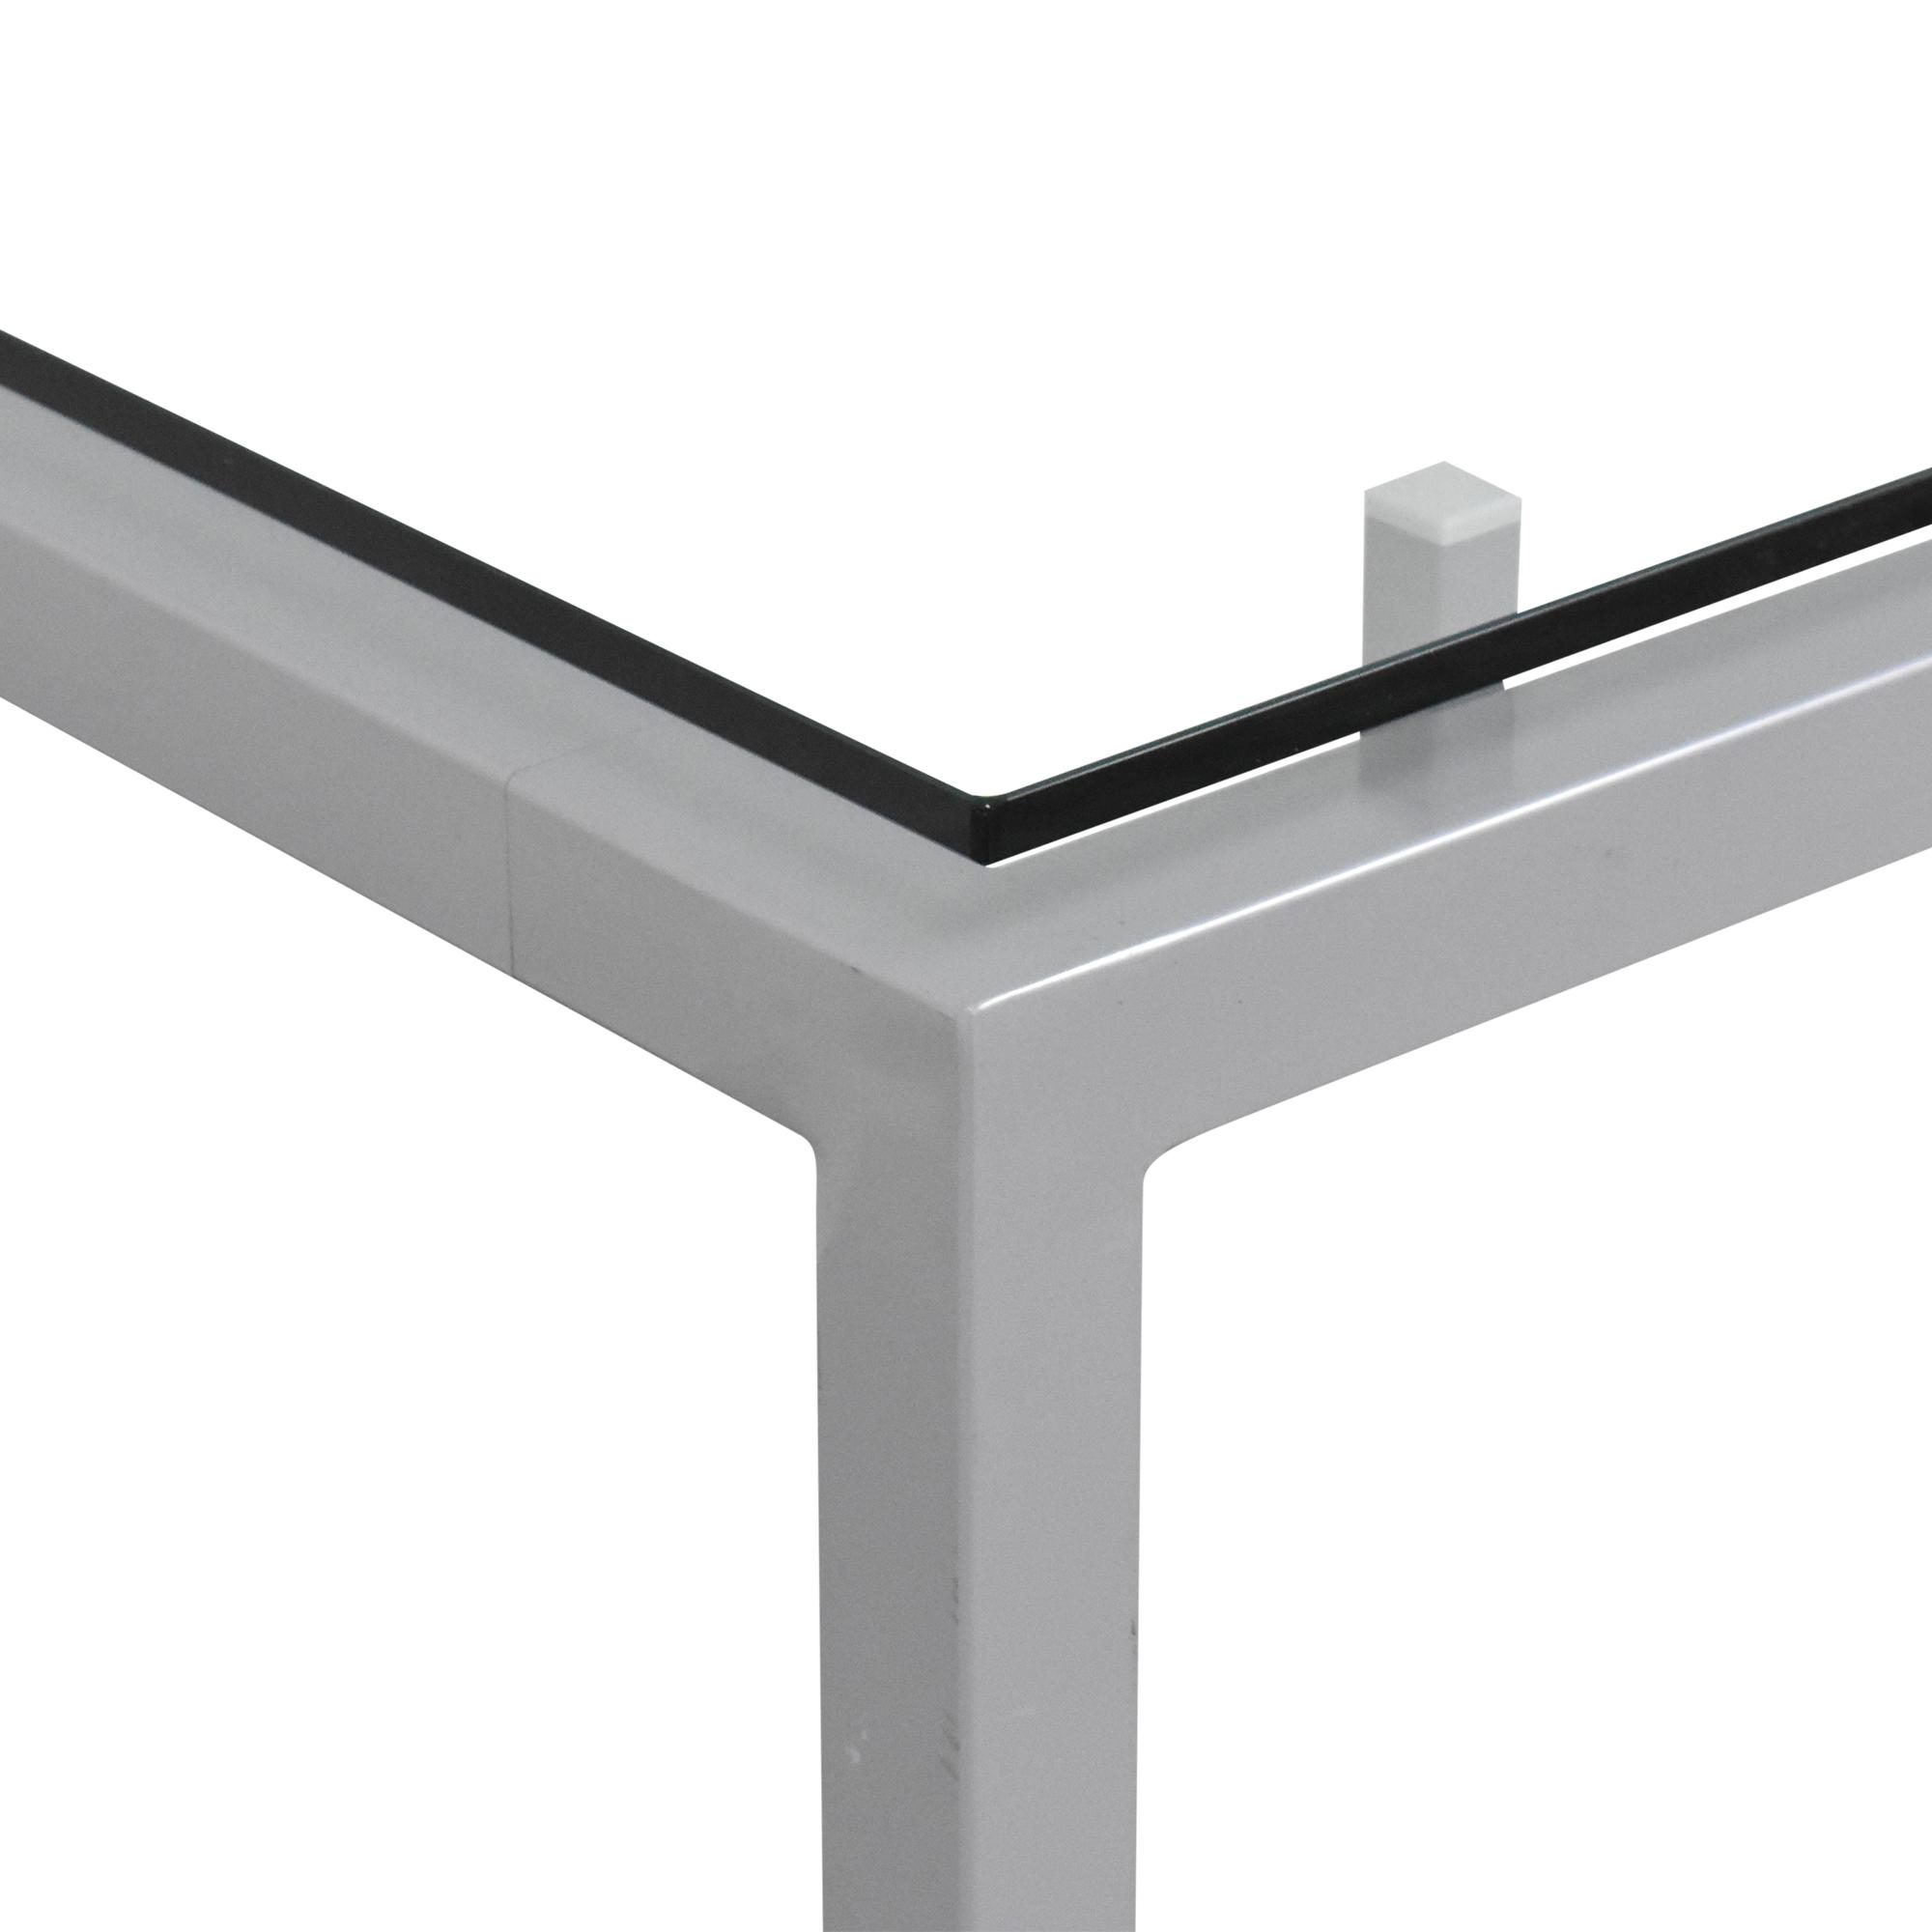 Design Within Reach Design Within Reach Tavola Table grey